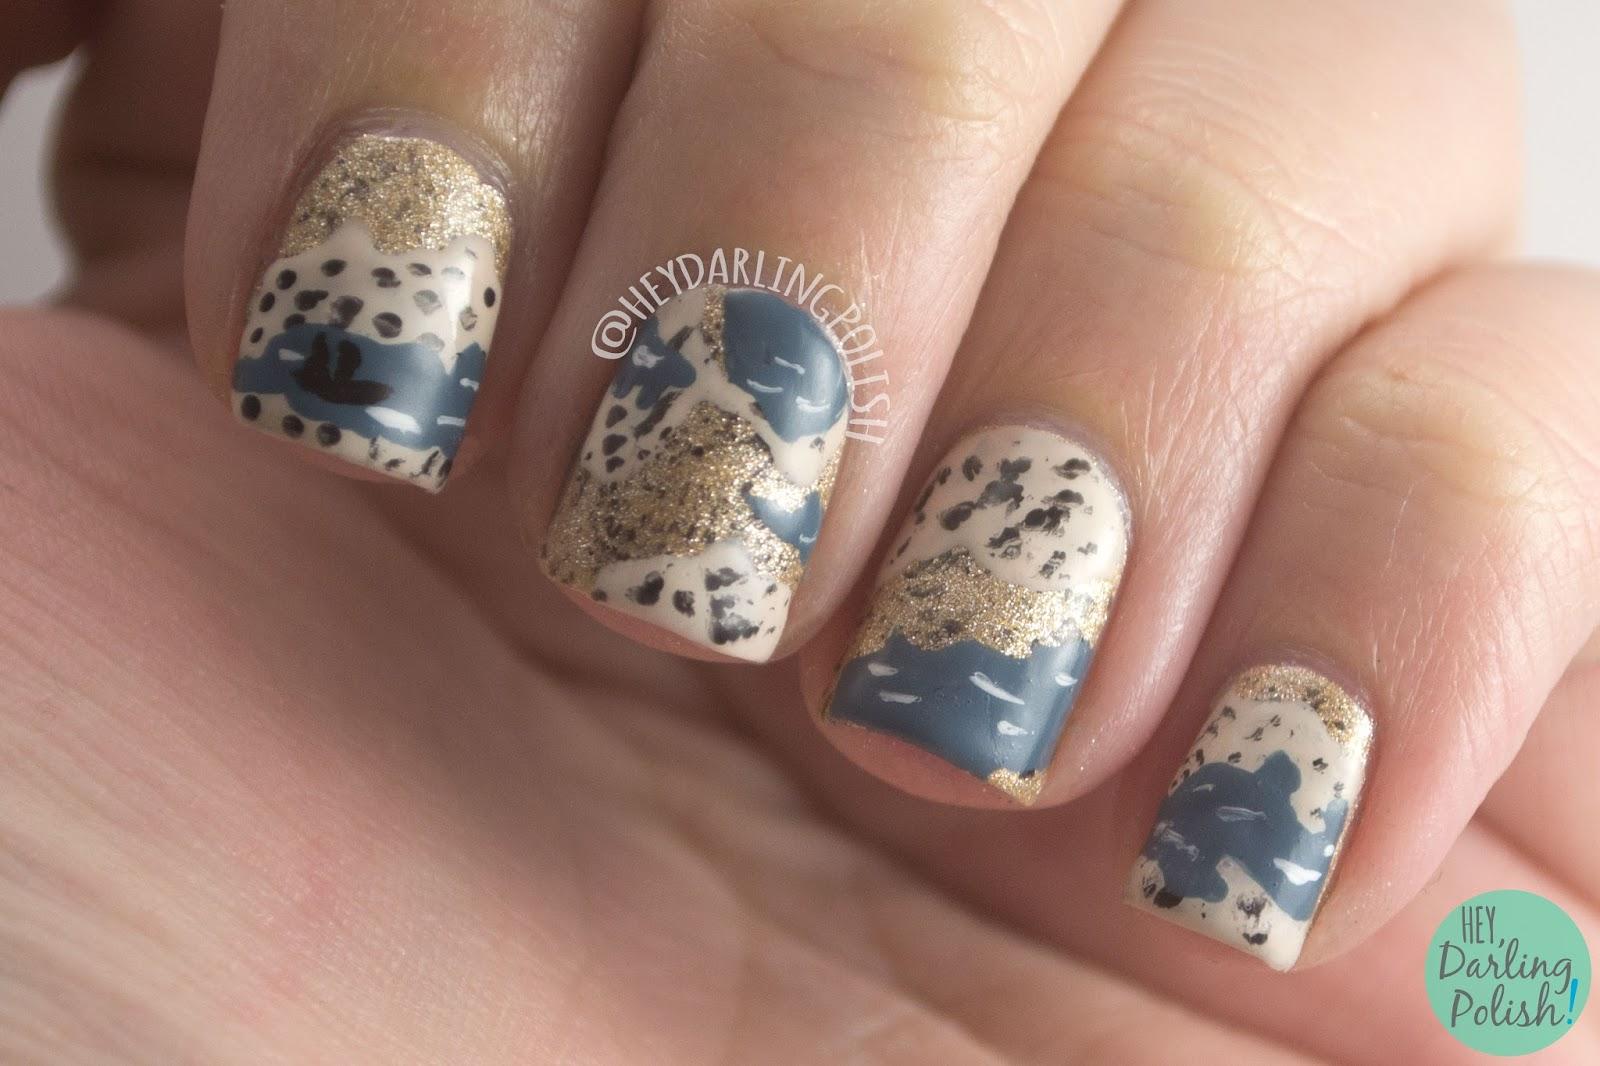 Hey, Darling Polish!: The Nail Challenge Collaborative: Books - Week 2